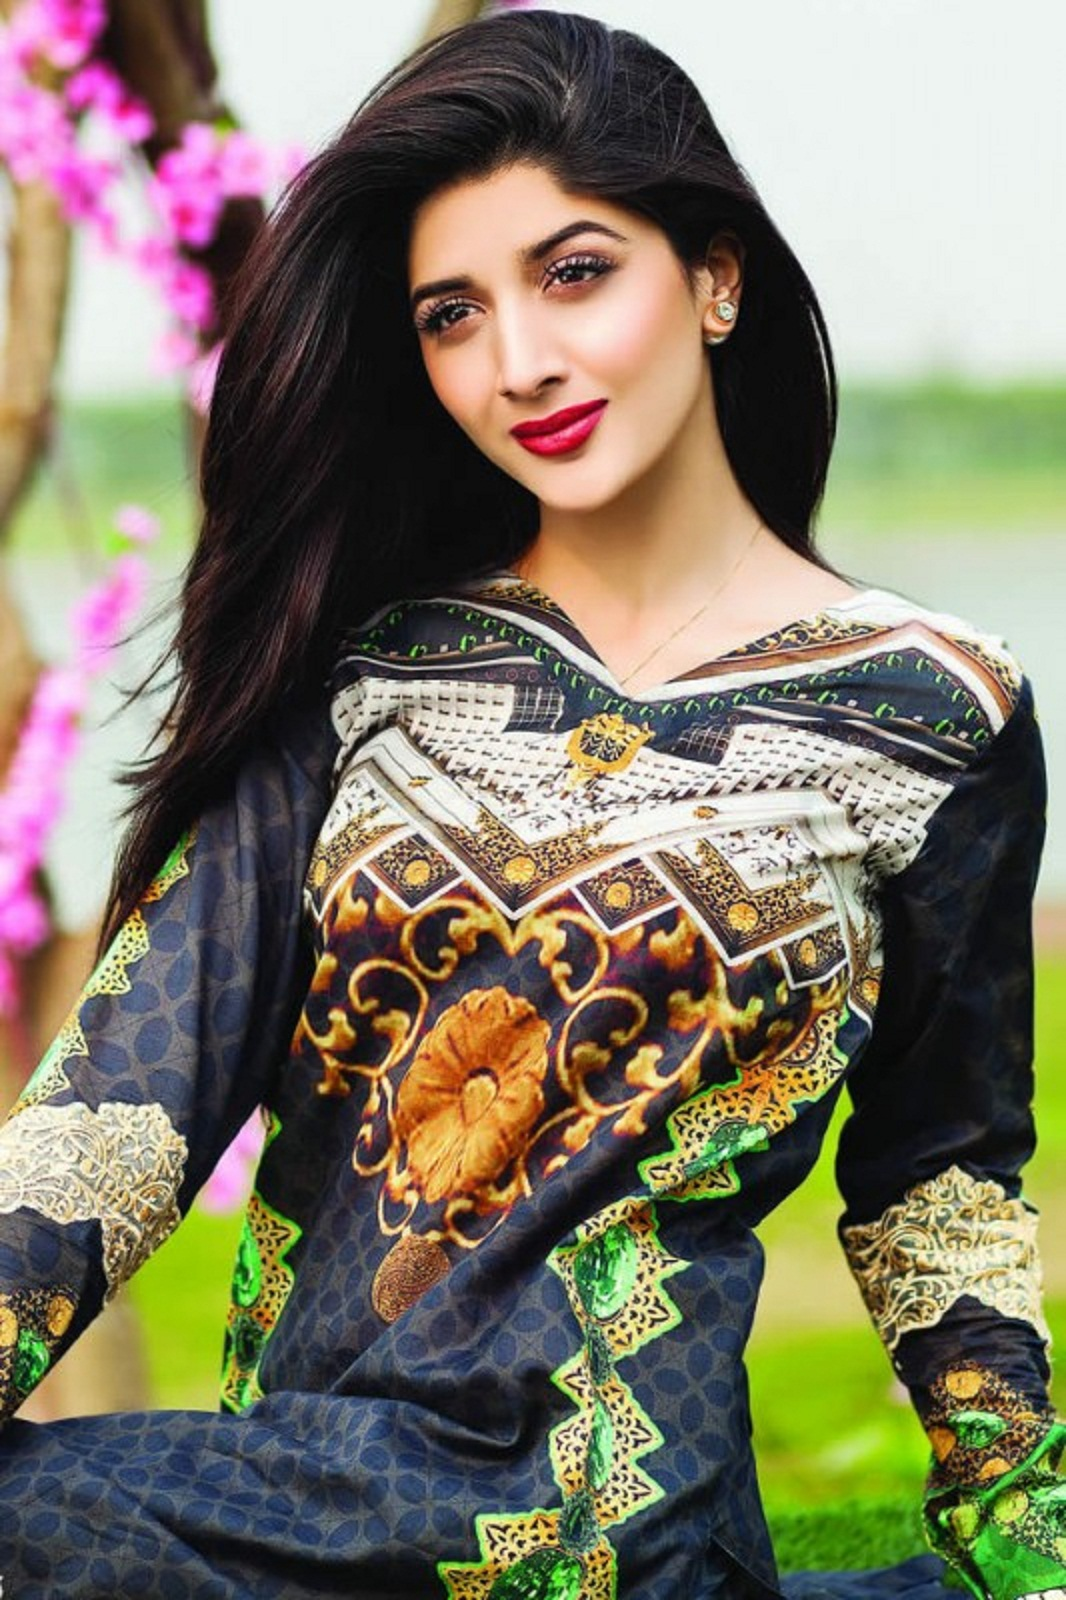 Mehwish Hayat Hd Wallpaper Free Stars Wallpaper Beautiful Mawra Hocane Hd Wallpaper